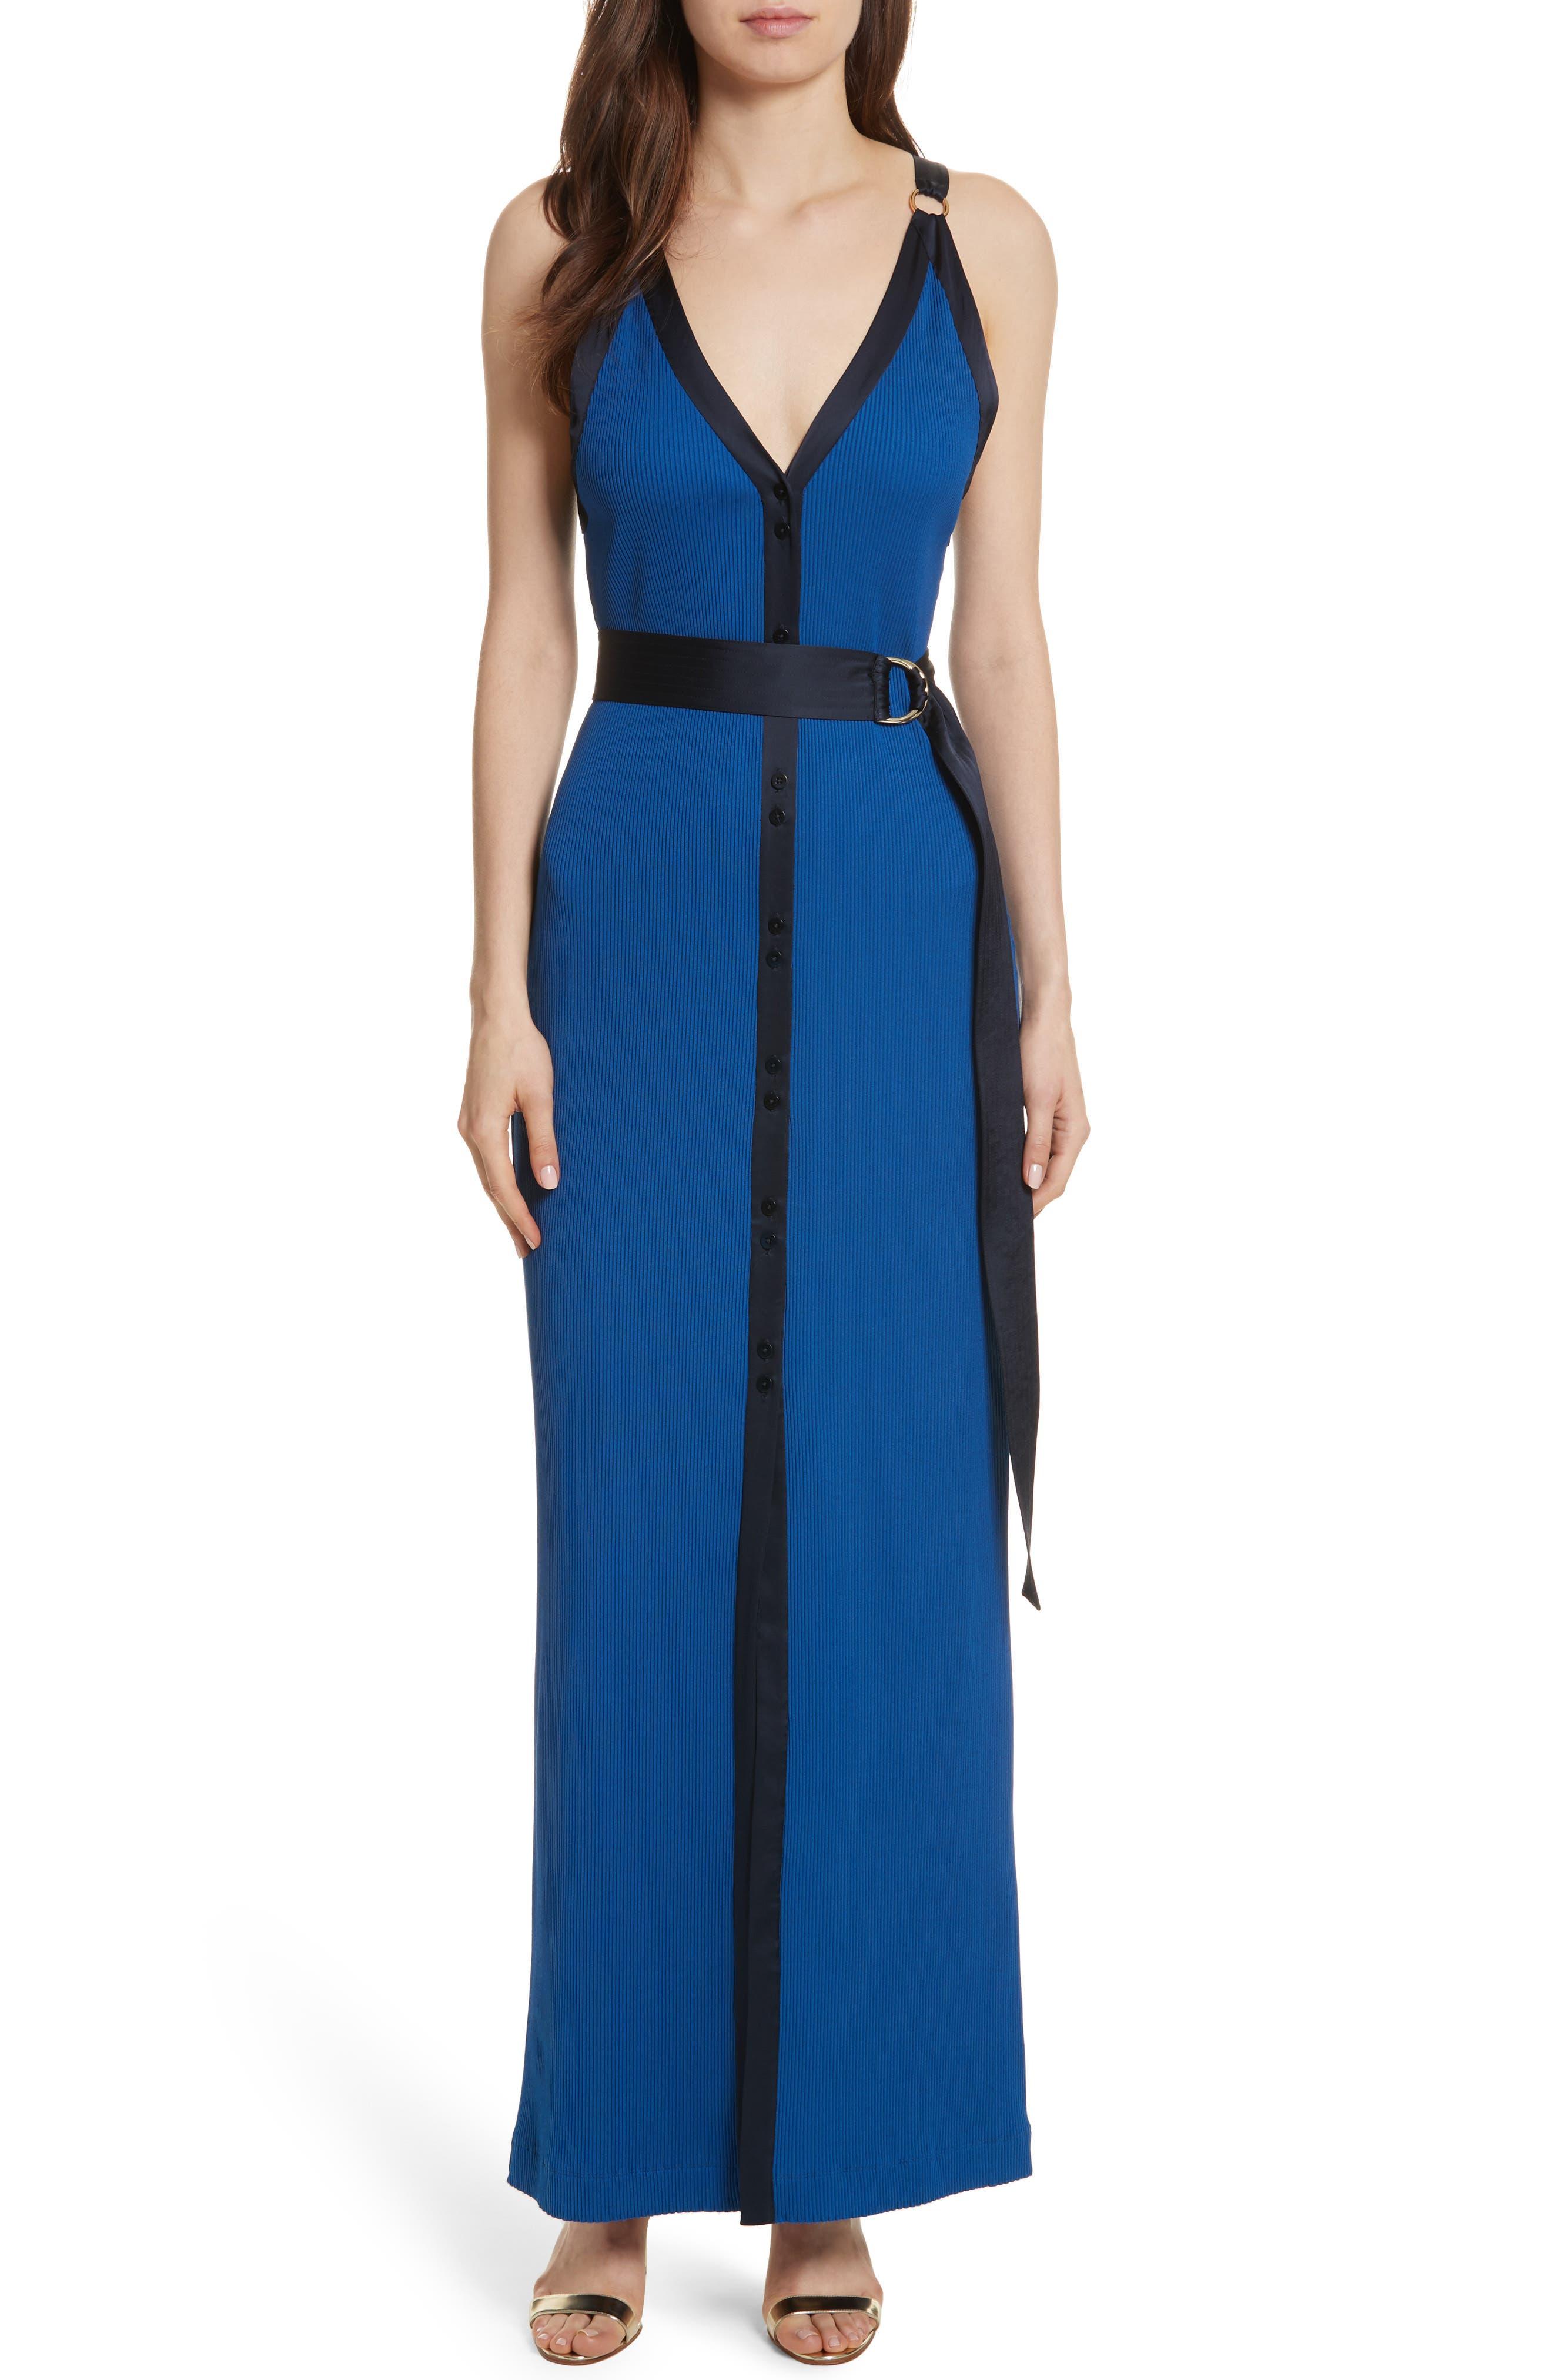 Diane von Furstenberg Ribbed Jersey Maxi Dress,                         Main,                         color, 412